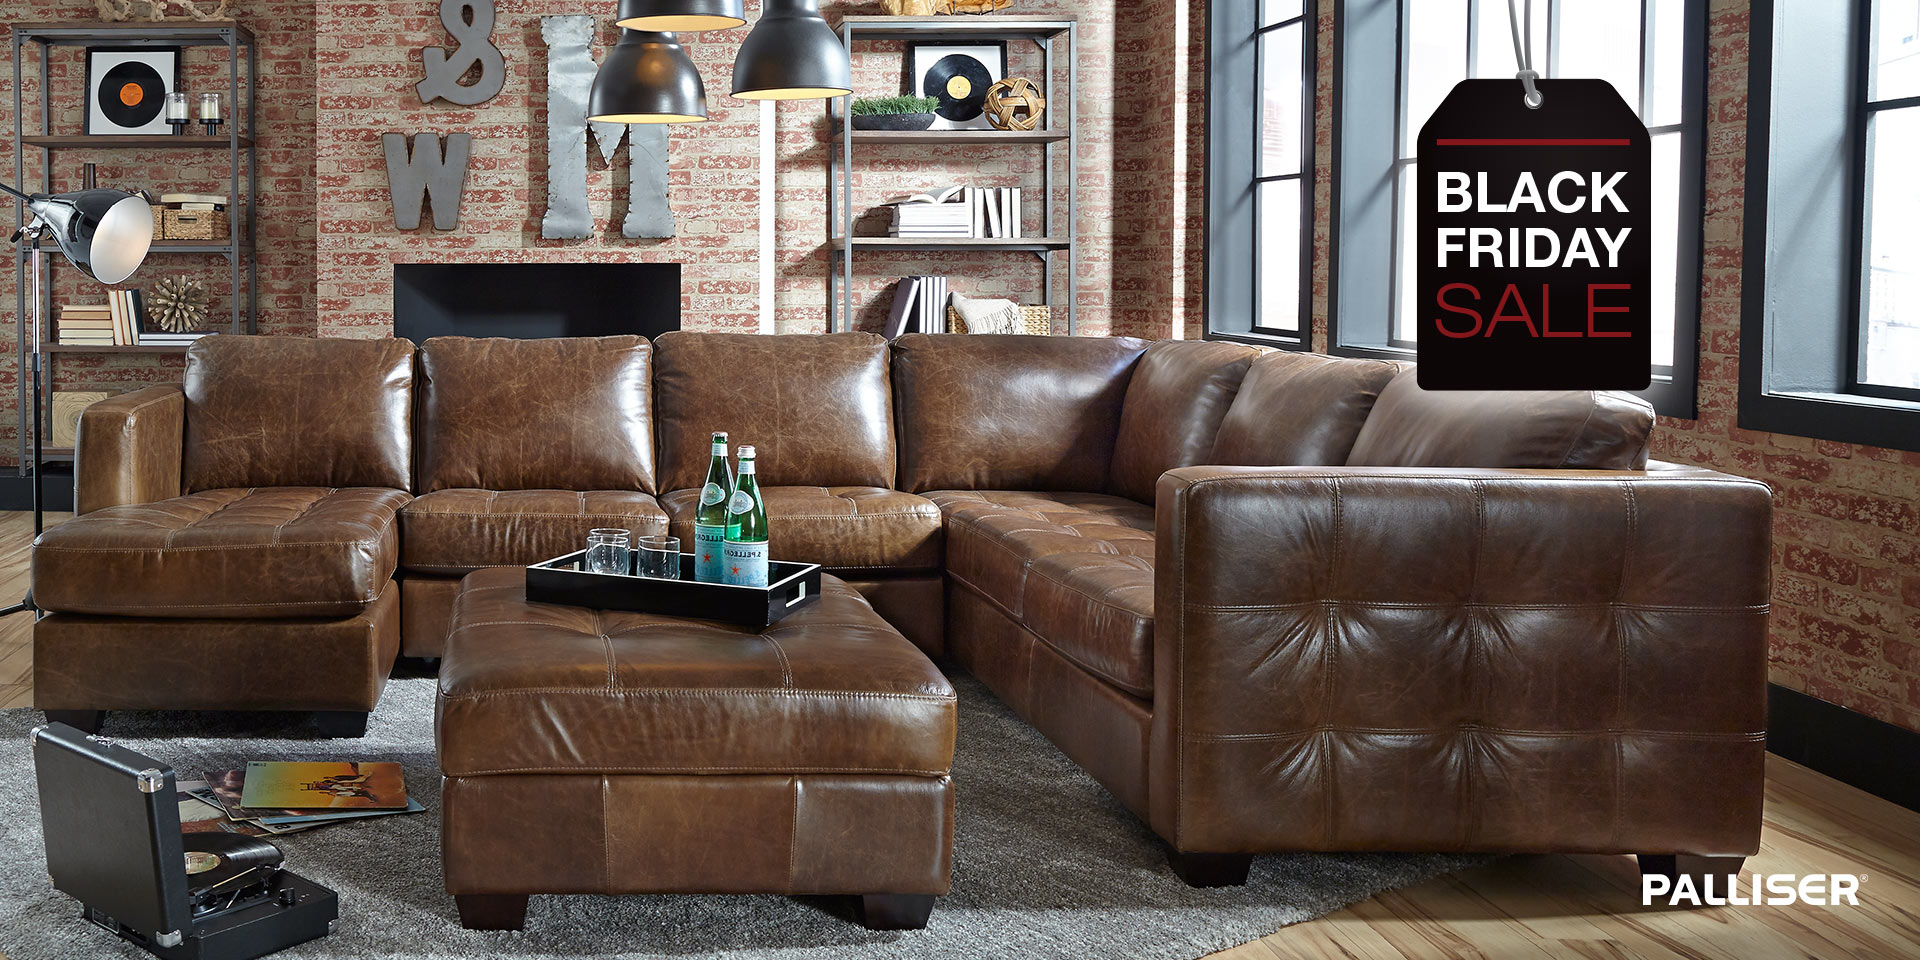 Wondrous Palliser Black Friday Sale Forma Furniture Gamerscity Chair Design For Home Gamerscityorg